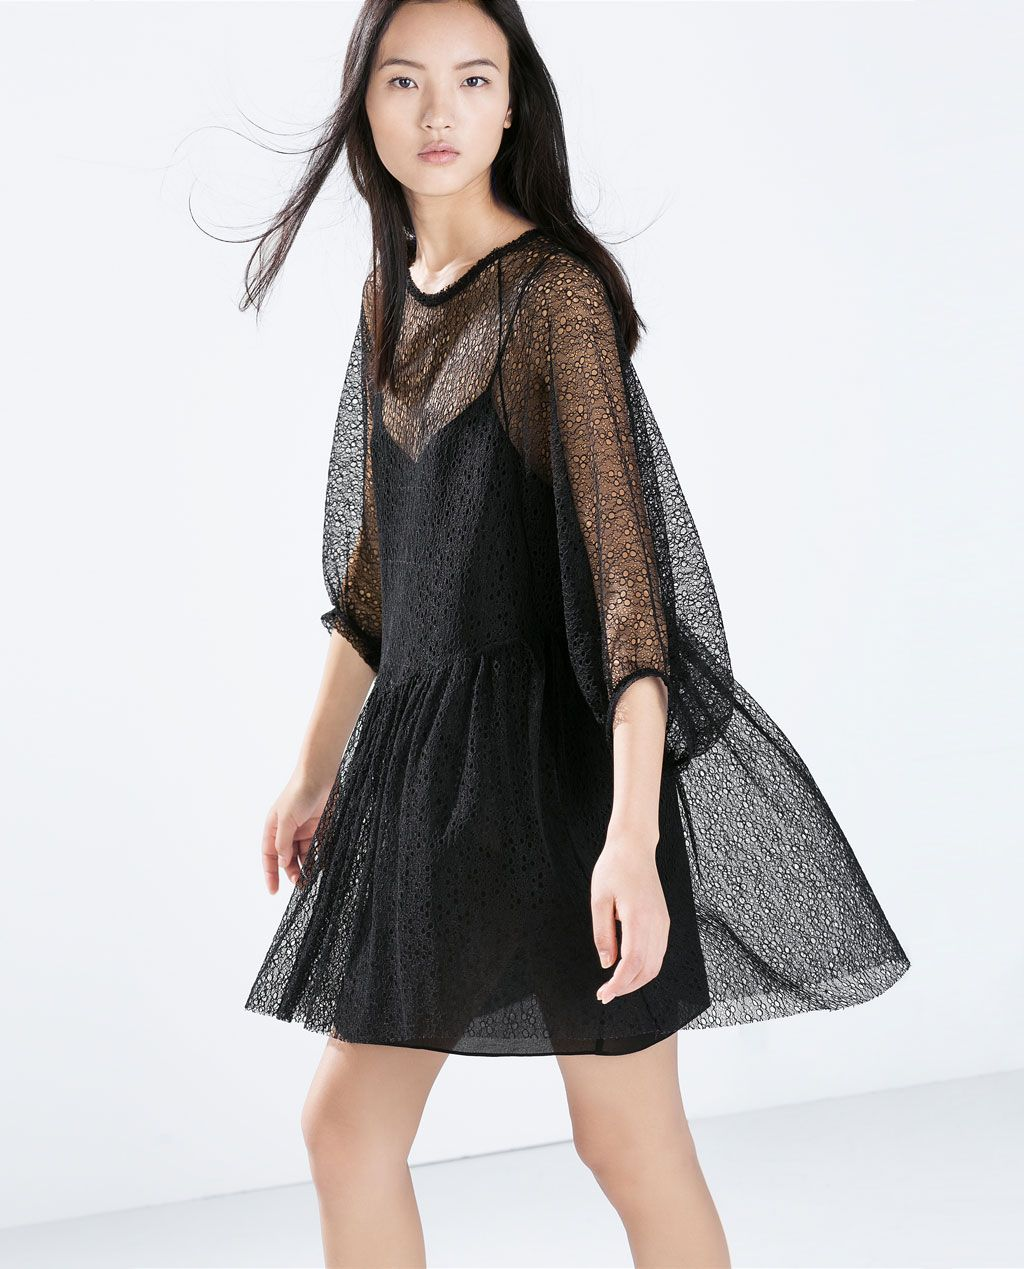 ZARA - DONNA - Studio dress | Wishful Thinking | Pinterest